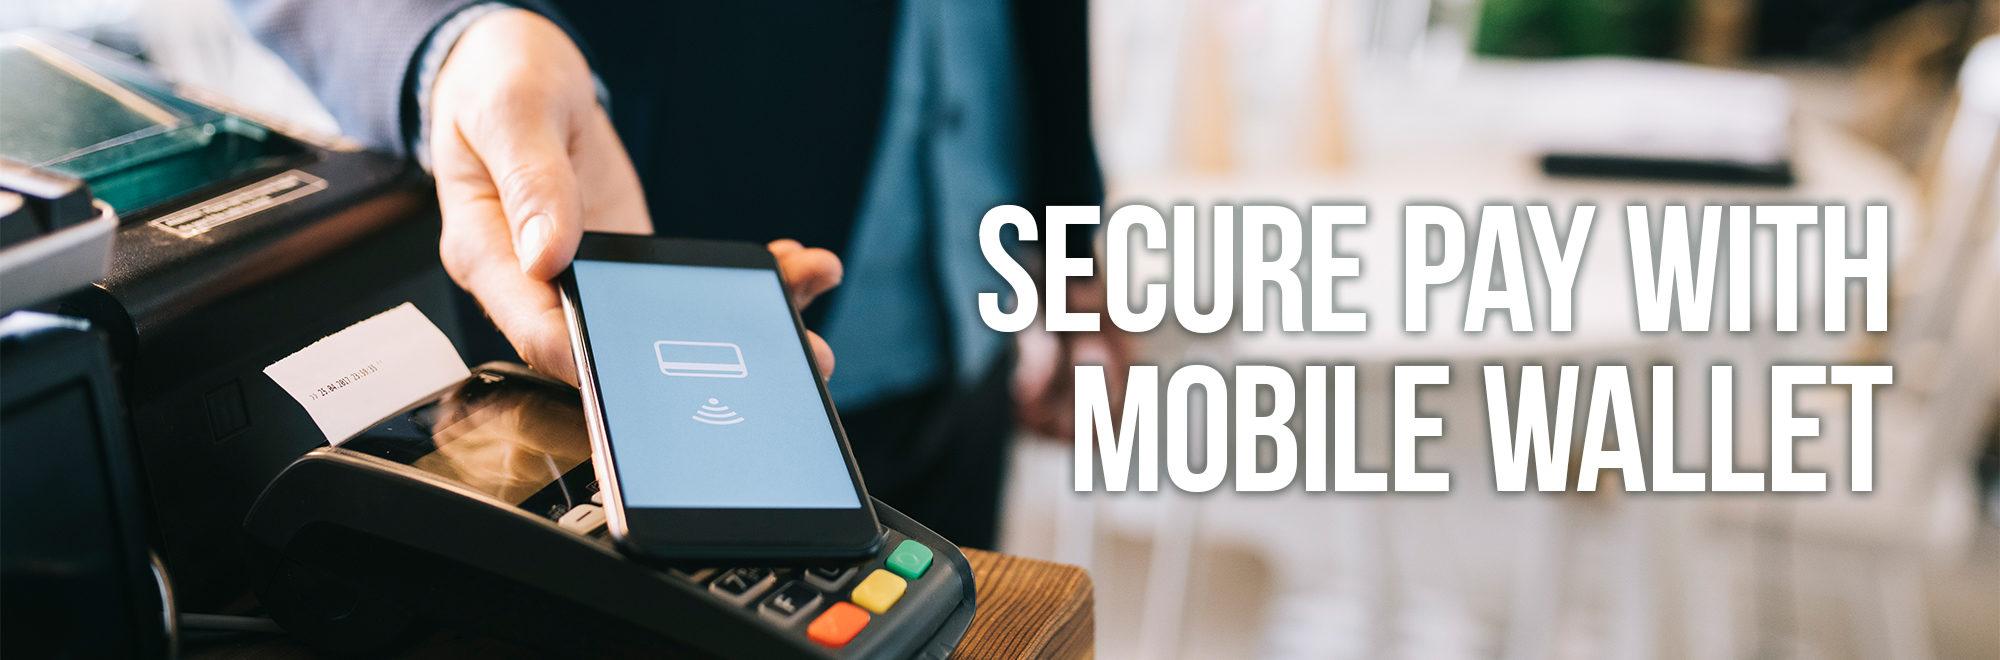 2020 Mobile Wallet